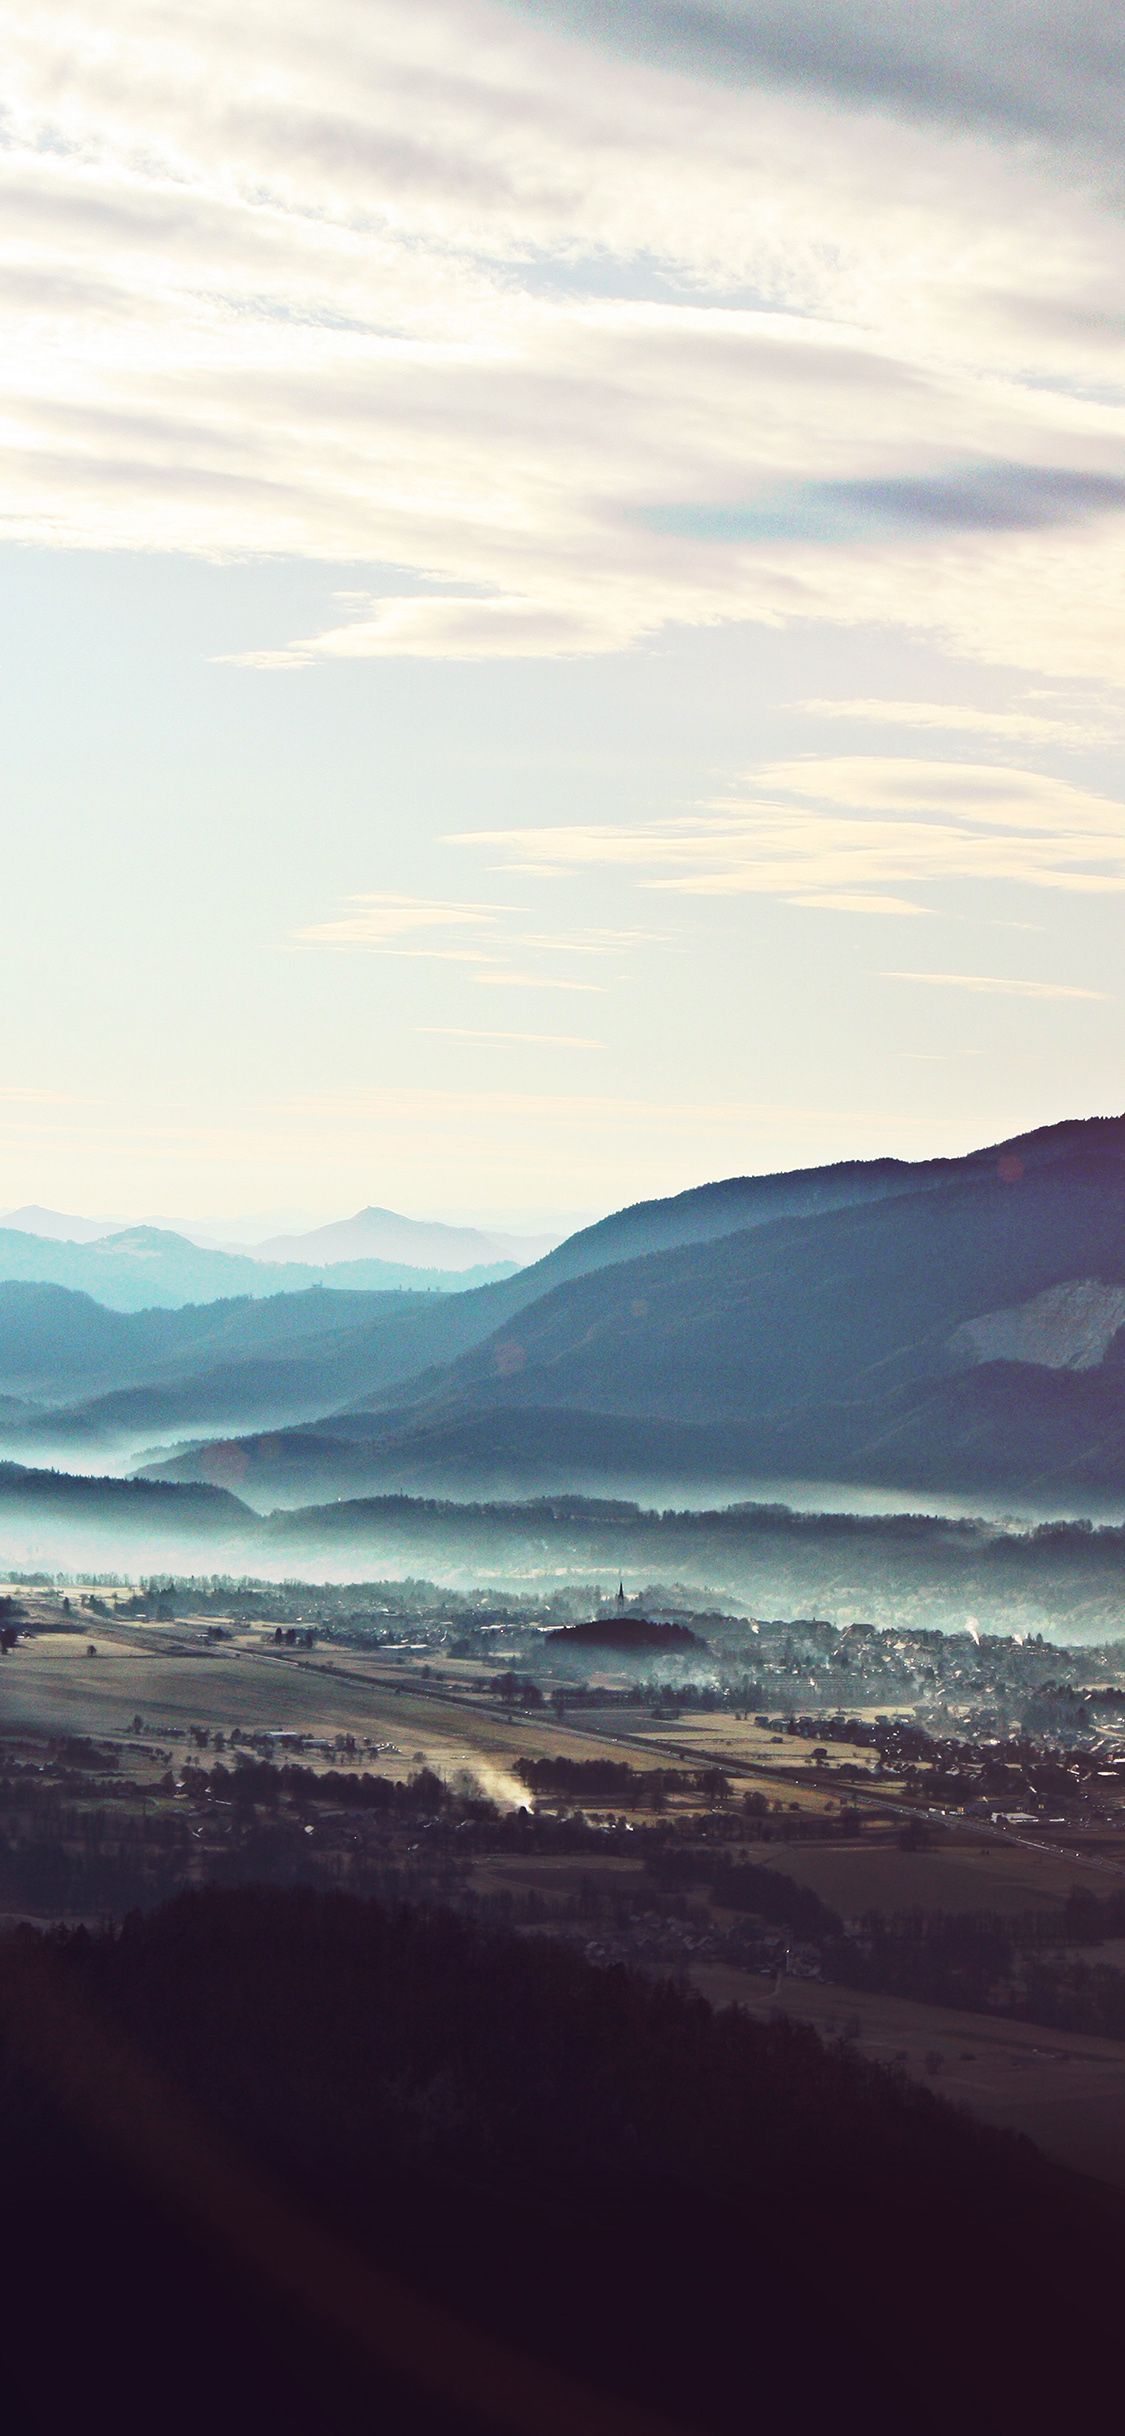 iPhonexpapers.com-Apple-iPhone-wallpaper-nc13-landscape-mountain-summer-blue-nature-flare